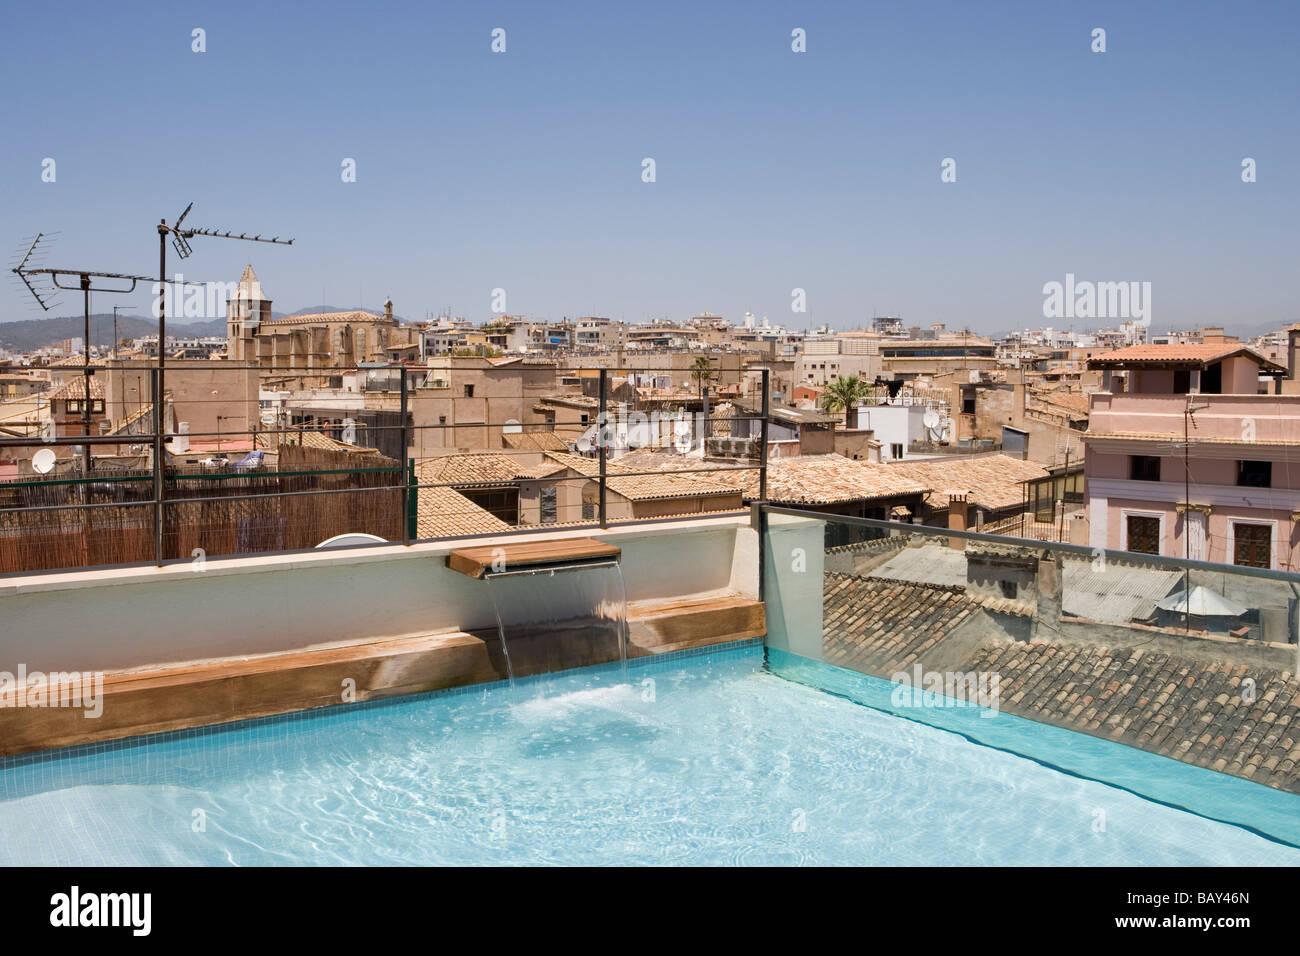 Hotel Tres Rooftop Plunge Pool, Palma, Mallorca, Balearic Islands, Spain - Stock Image